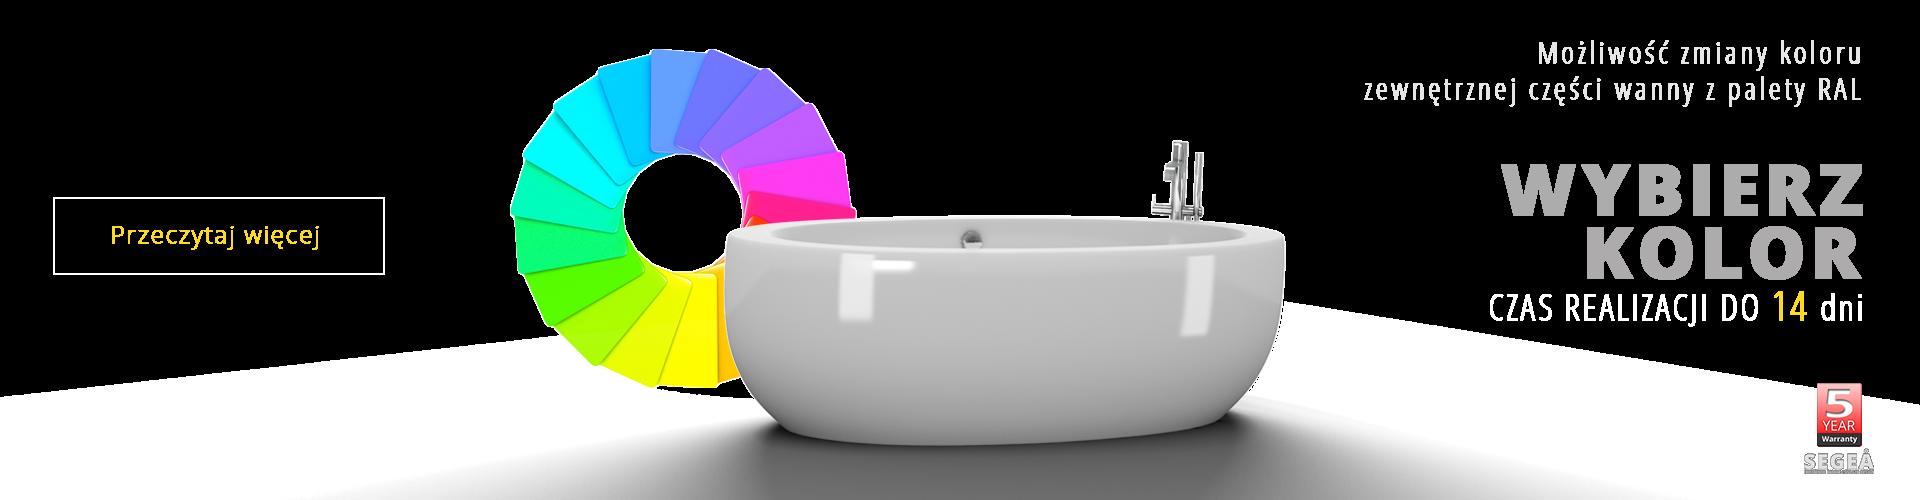 Wybierz wannę SEGEA w kolorze